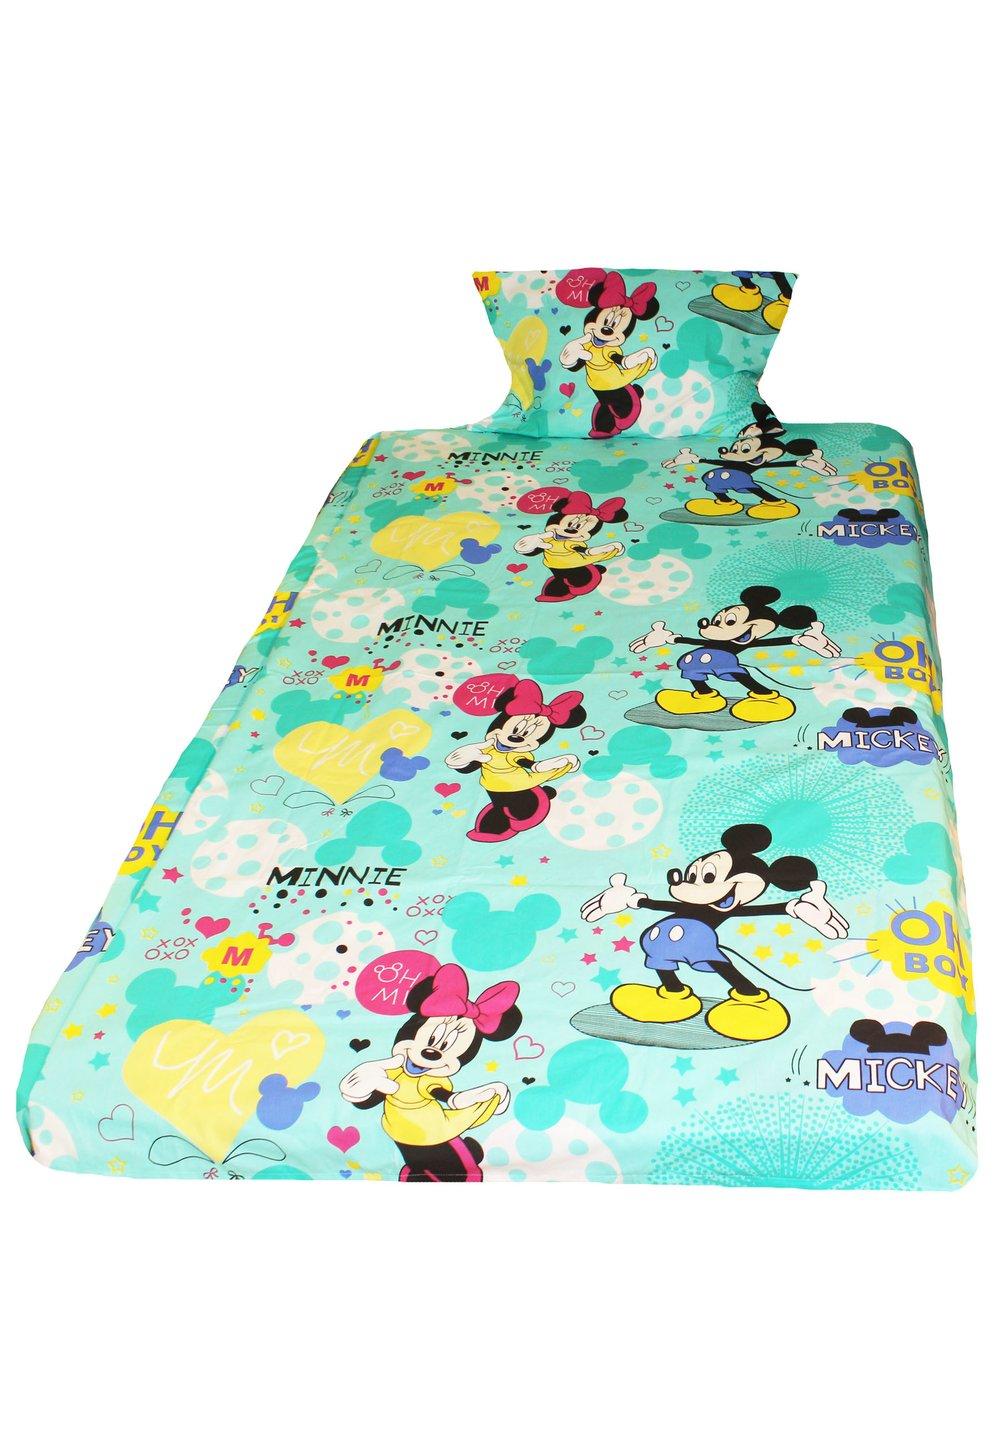 Lenjerie de pat 3 piese, Minnie si Mickey, turcoaz, 160 x 200 cm imagine